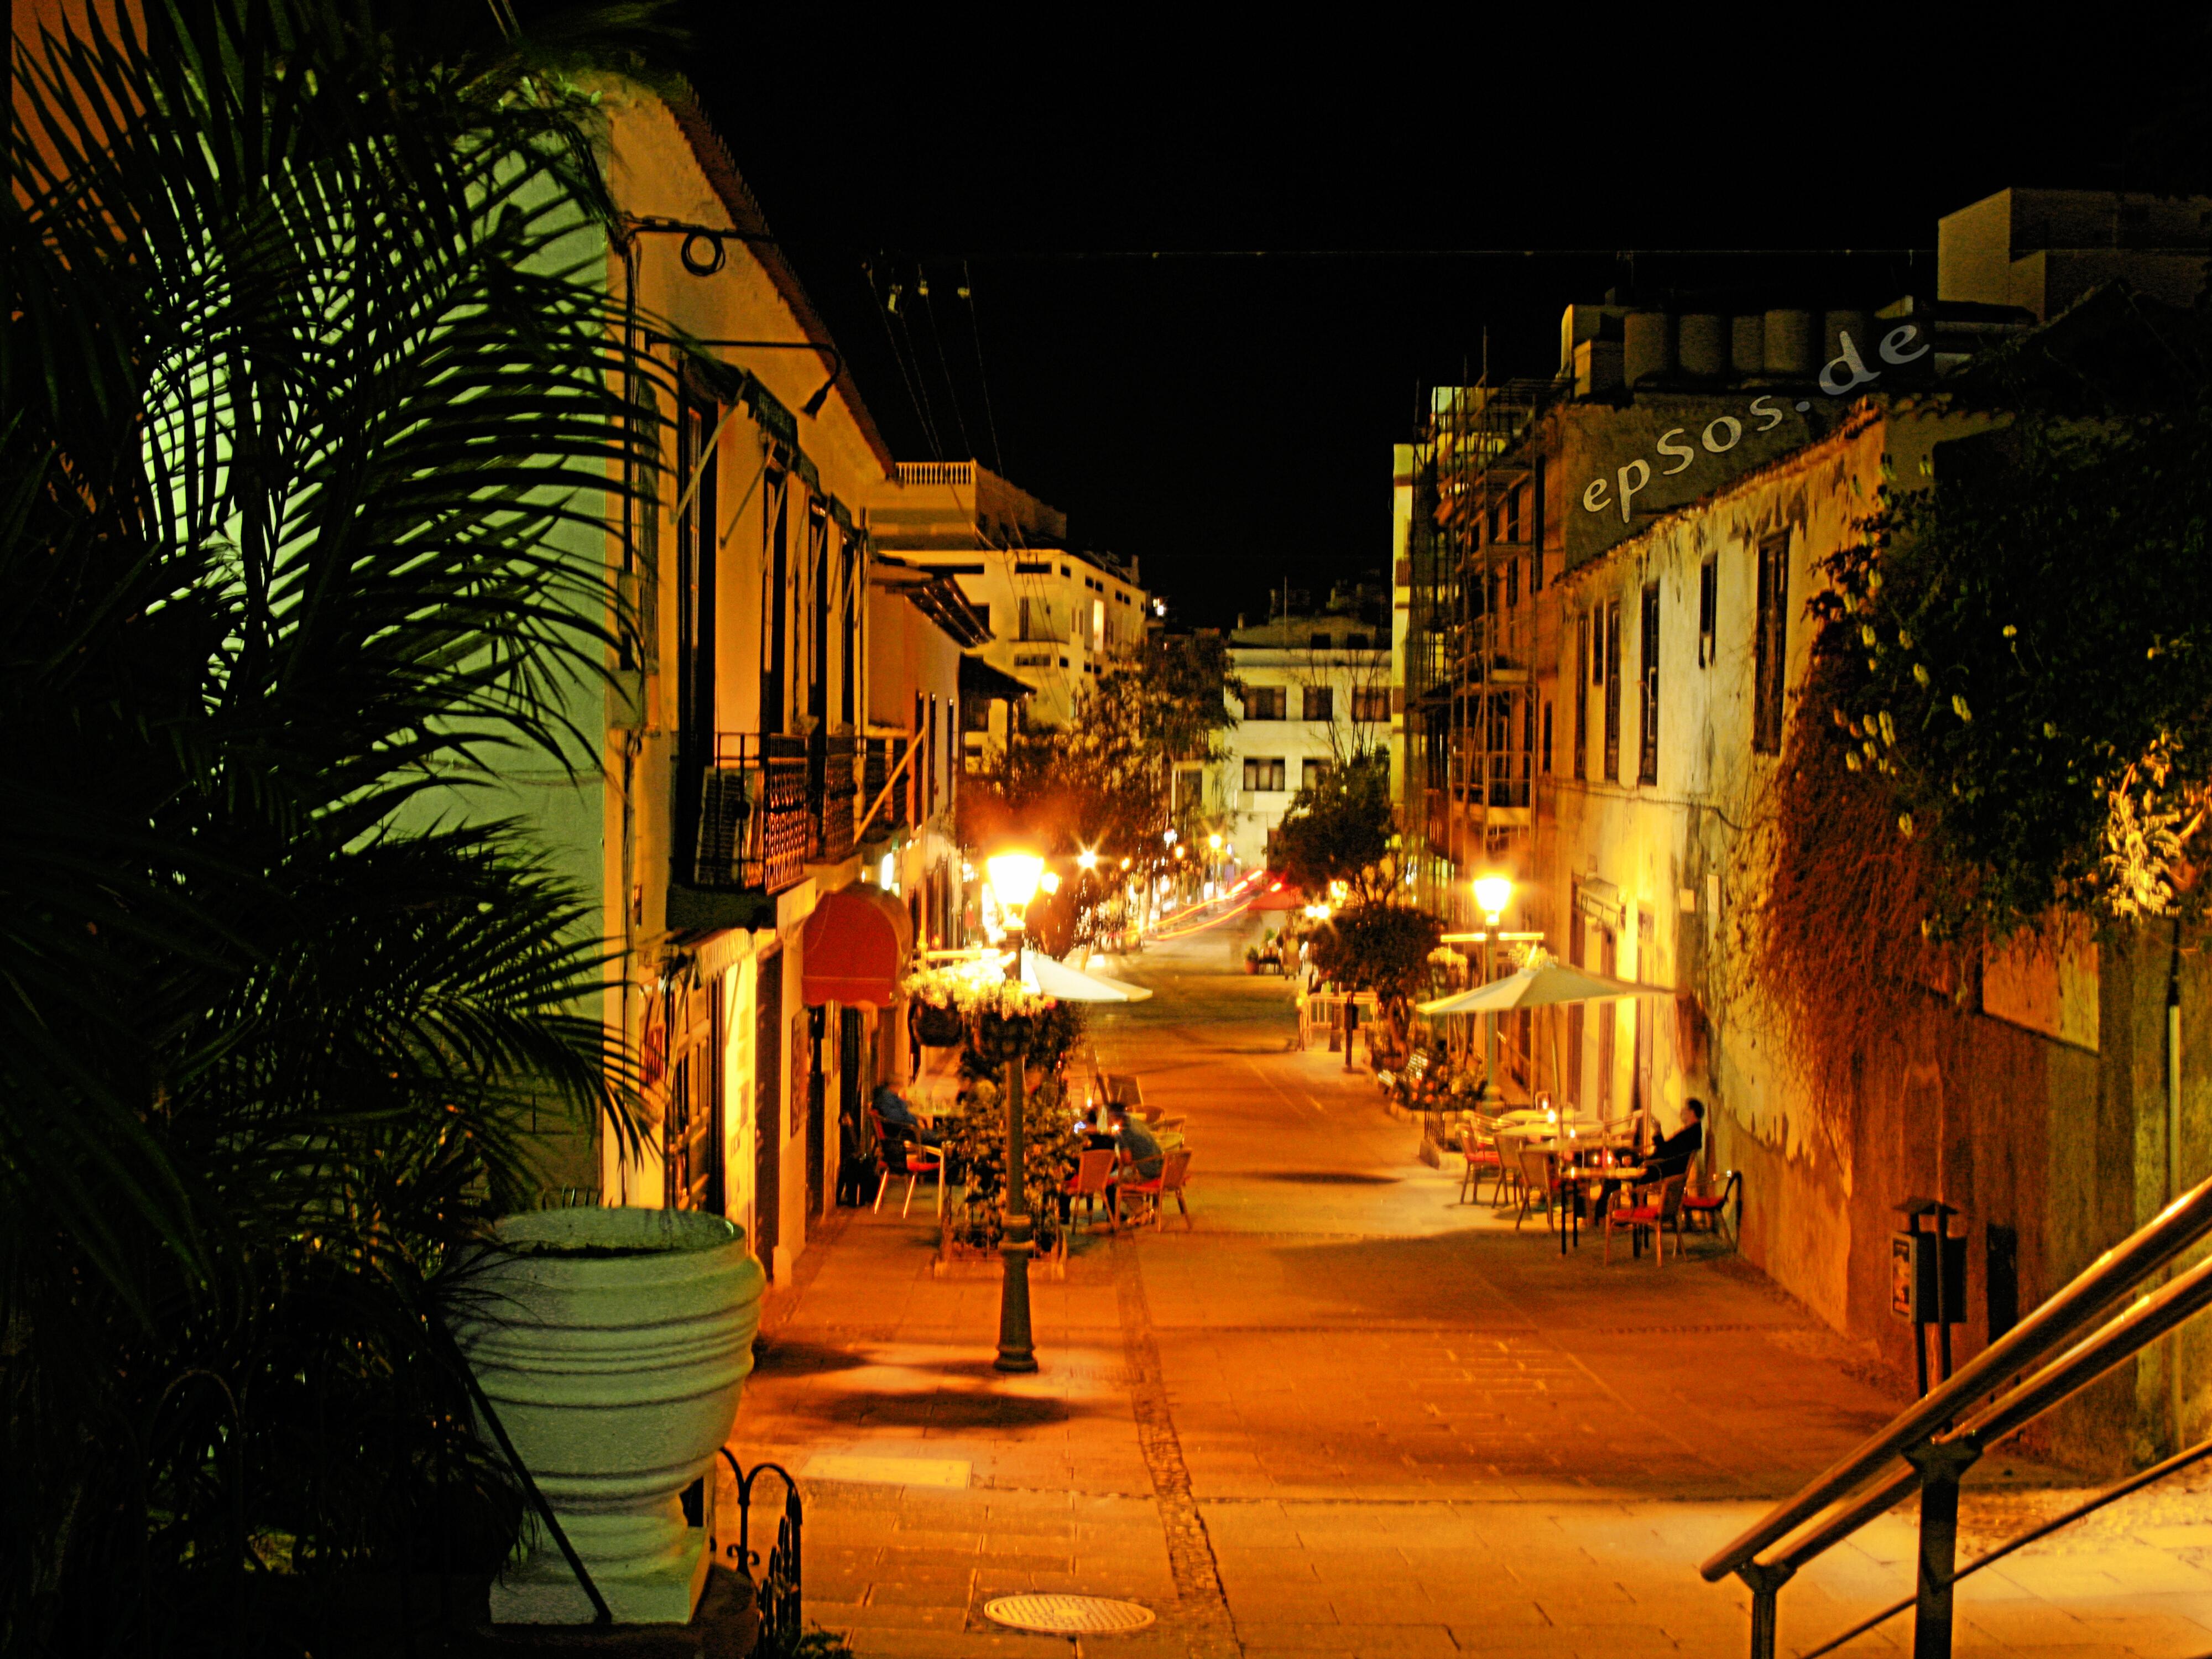 Night light wikipedia - File Glowing Bar City Street Night Lights Jpg